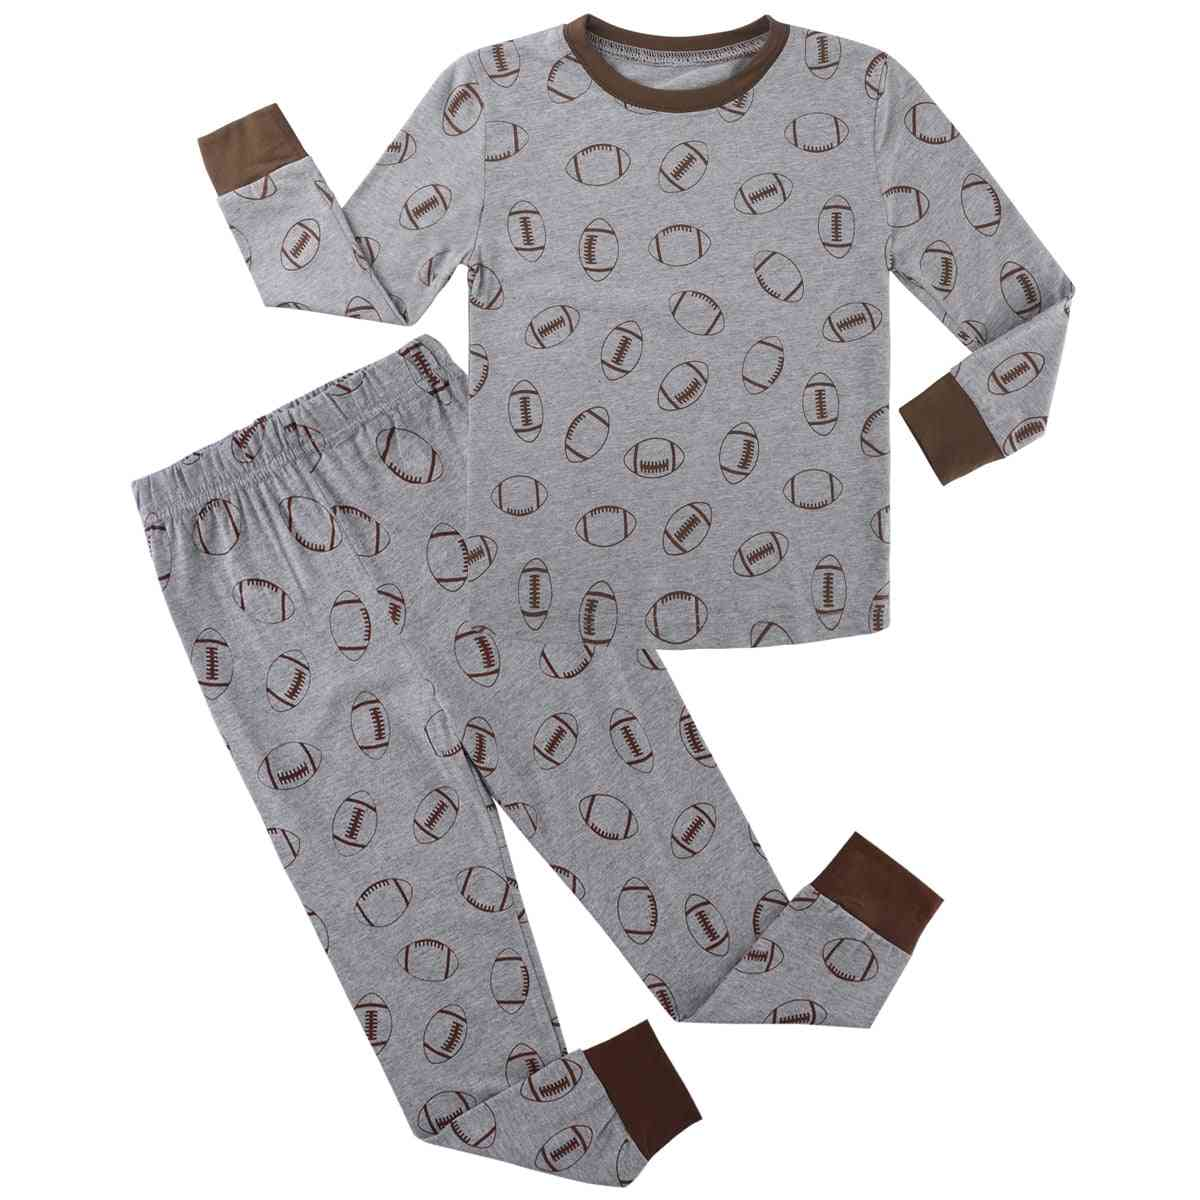 Christmas Pajama Sets, Toddler Sleepwear Long Sleeve Pajama Sets